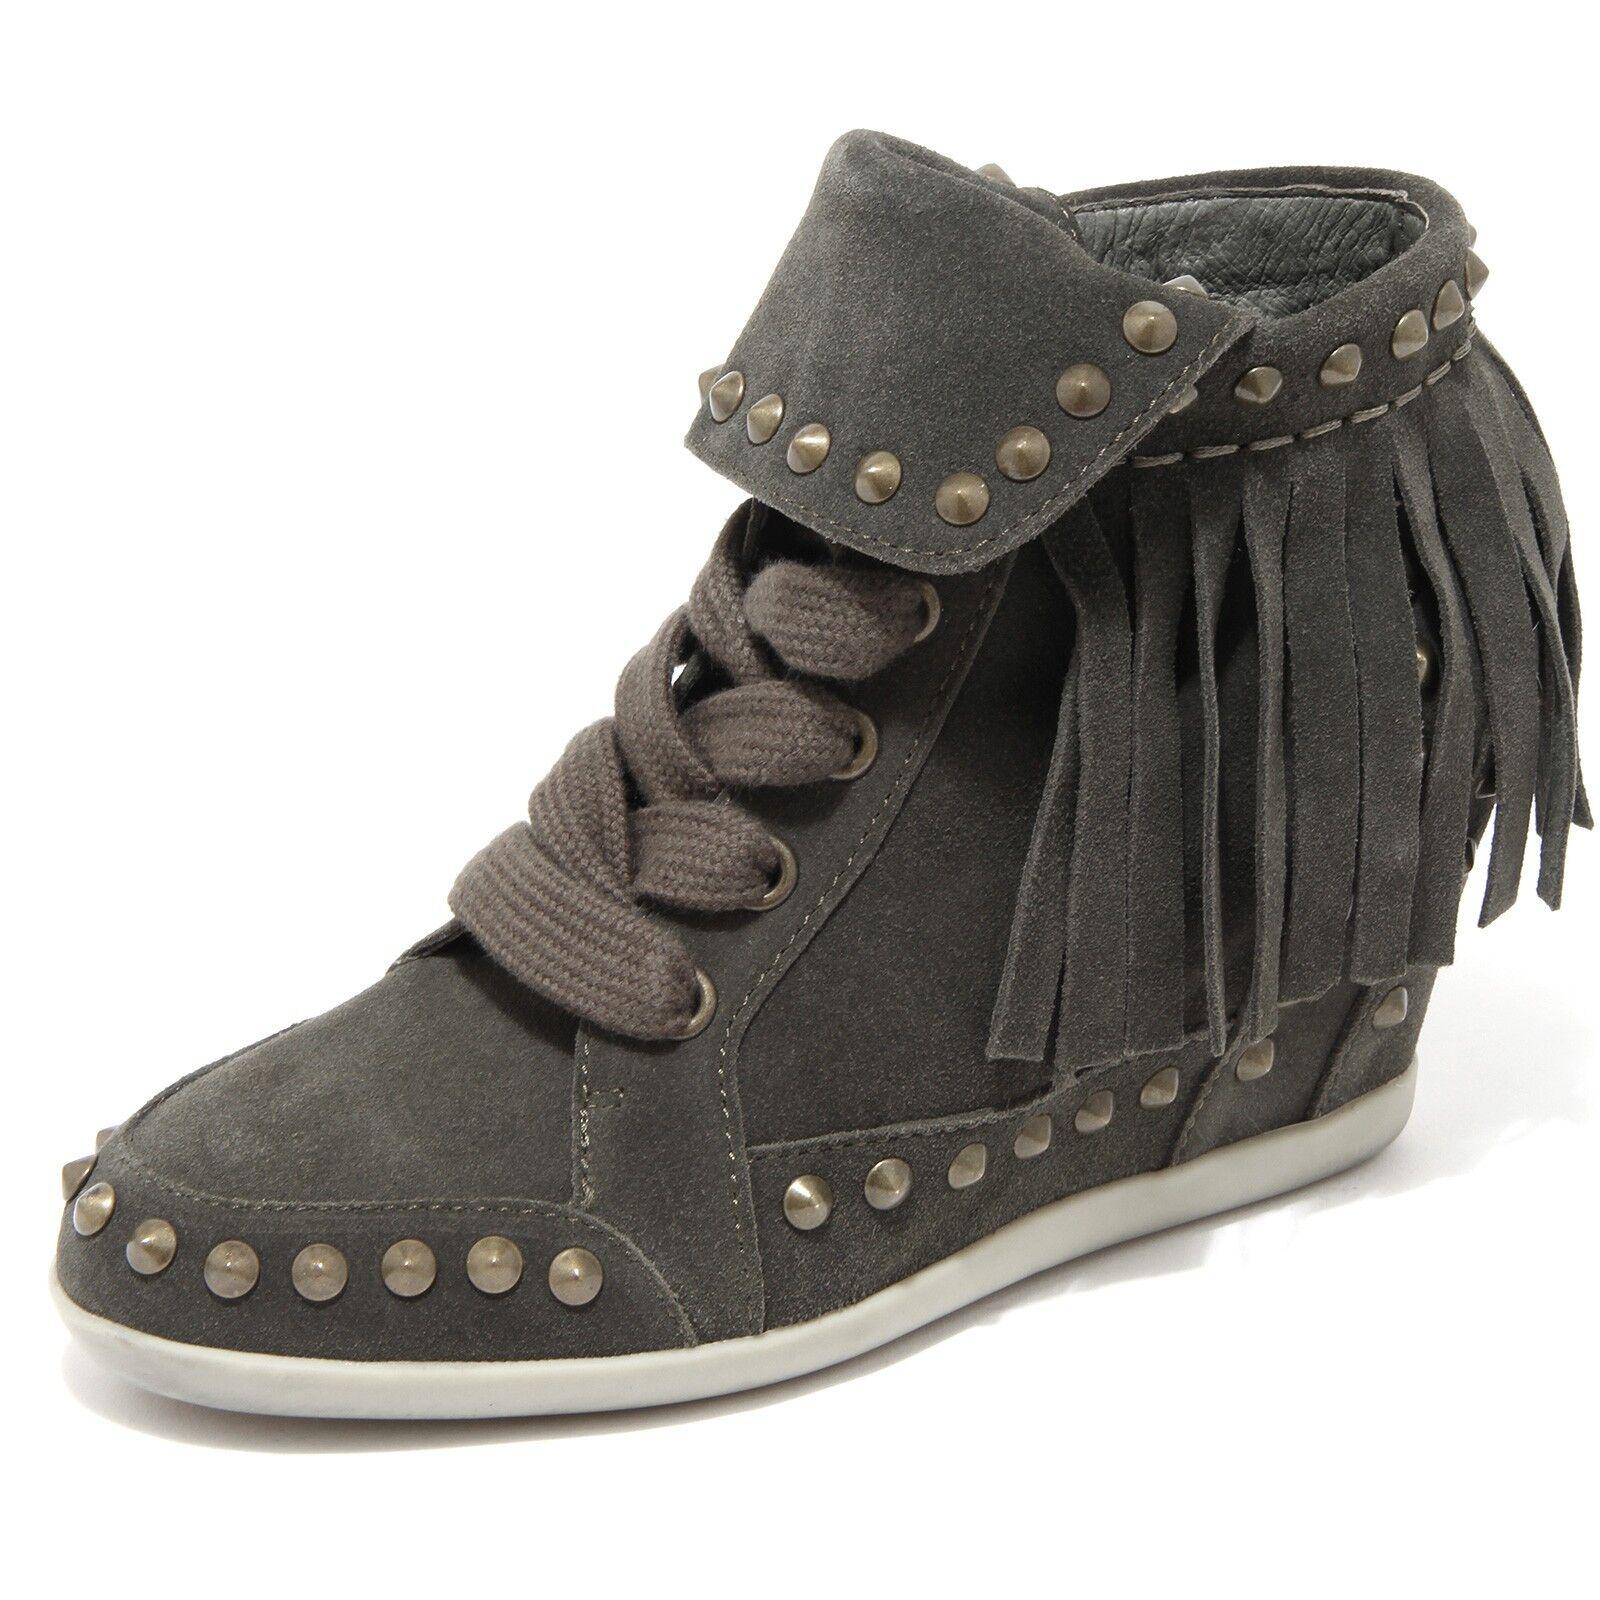 vendite calde 86739 86739 86739 scarpe da ginnastica ASH BABA scarpa donna scarpe donna  forma unica